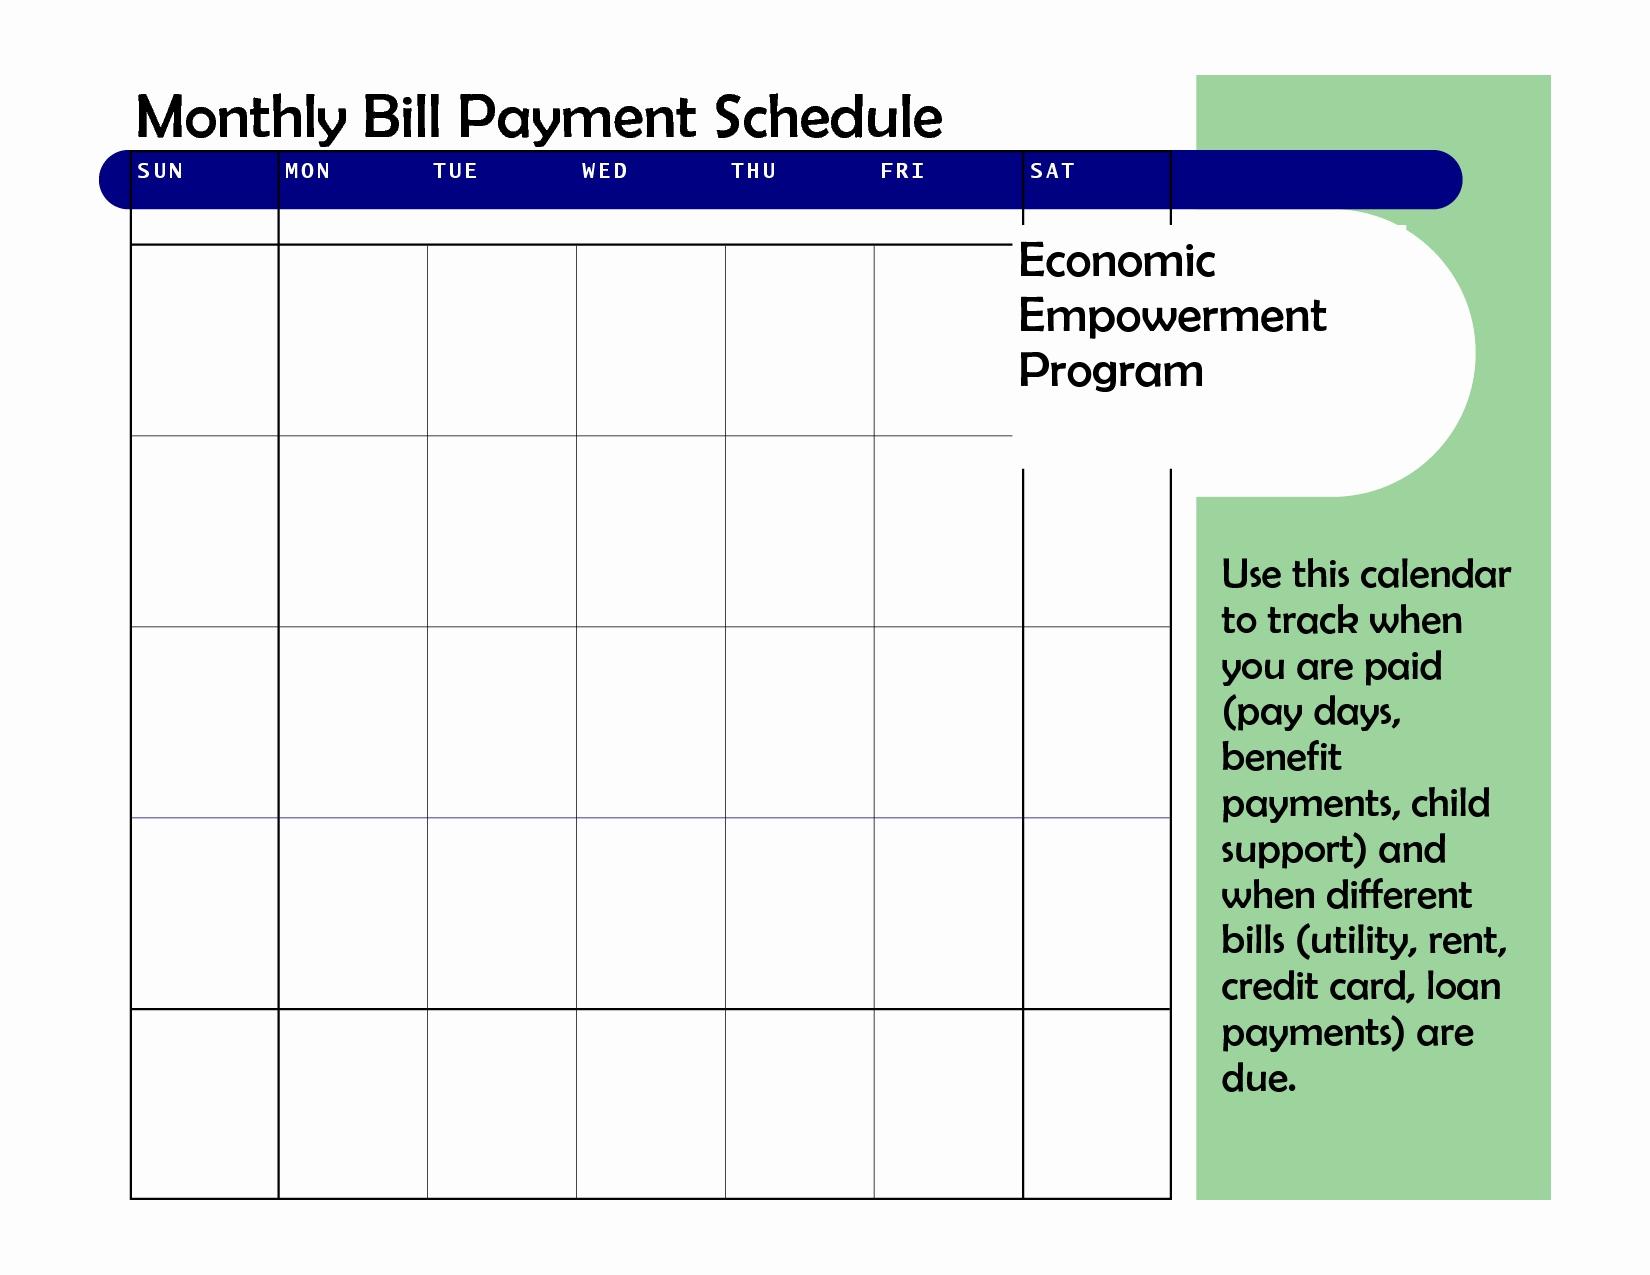 Monthly Bill Calendar Excel Template Organizer Freement | Askoverflow regarding Free Printable Monthly Bill Payment Calendar